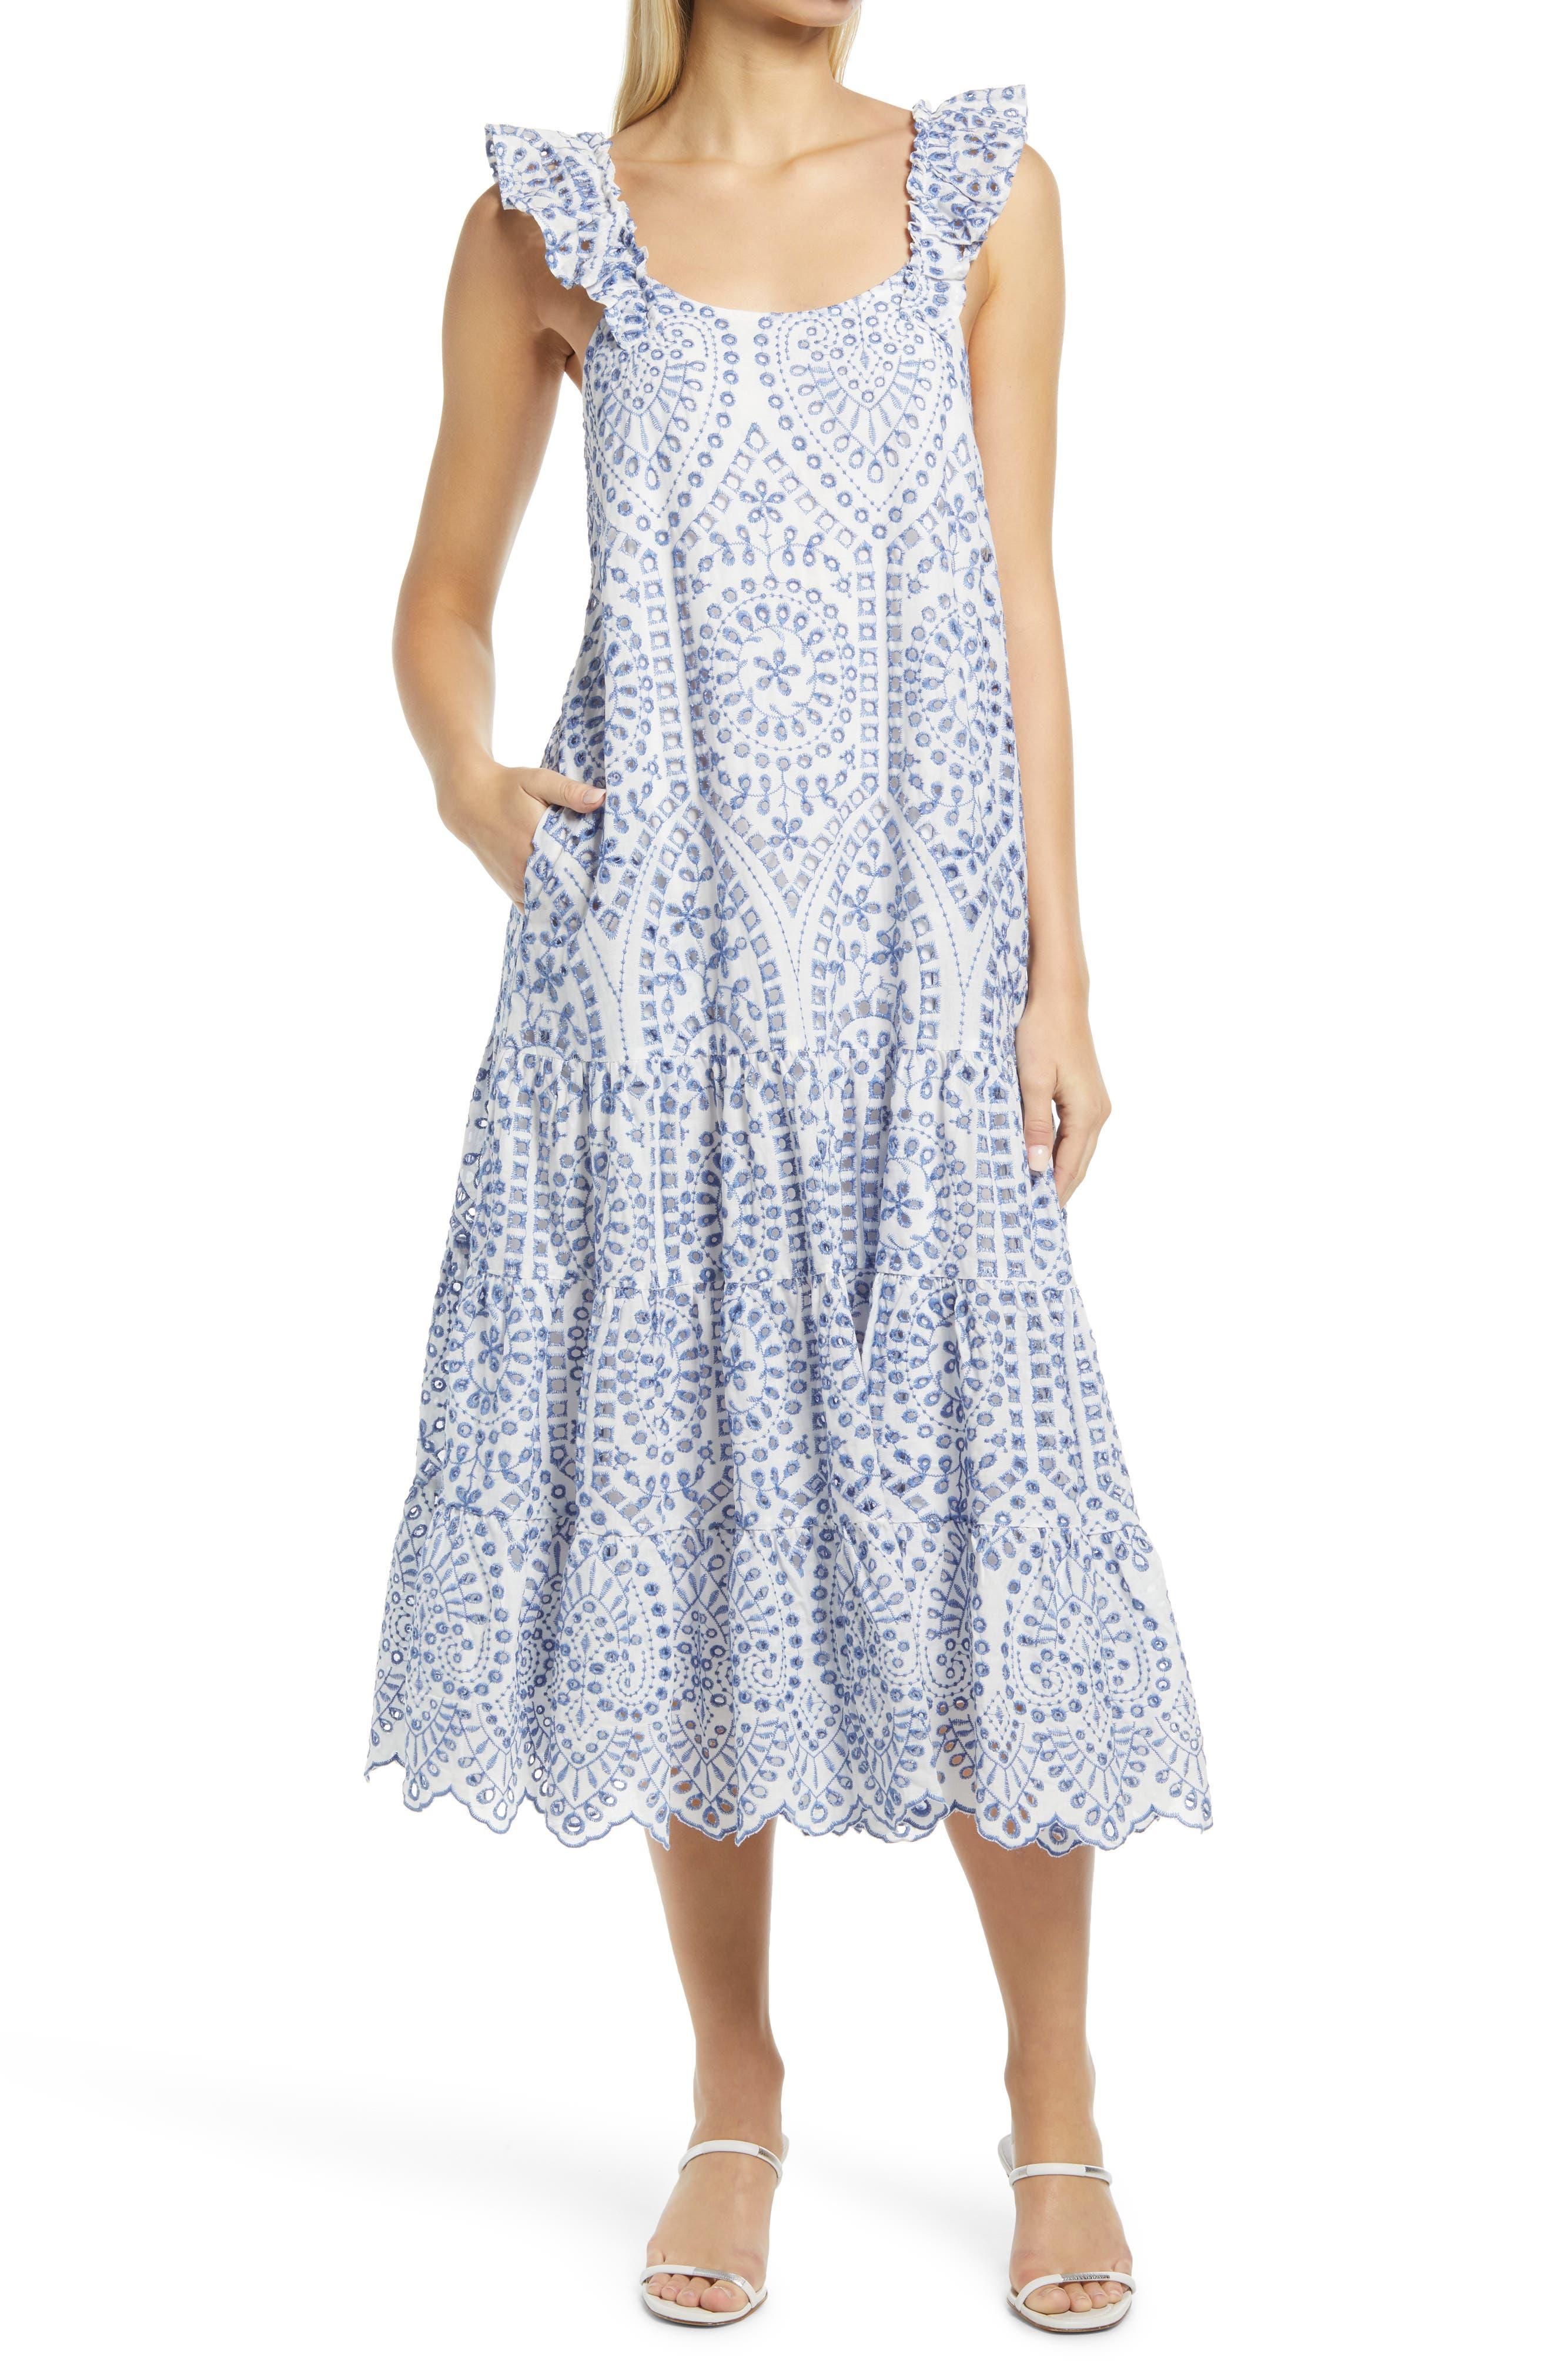 Cotton Eyelet A-Line Dress